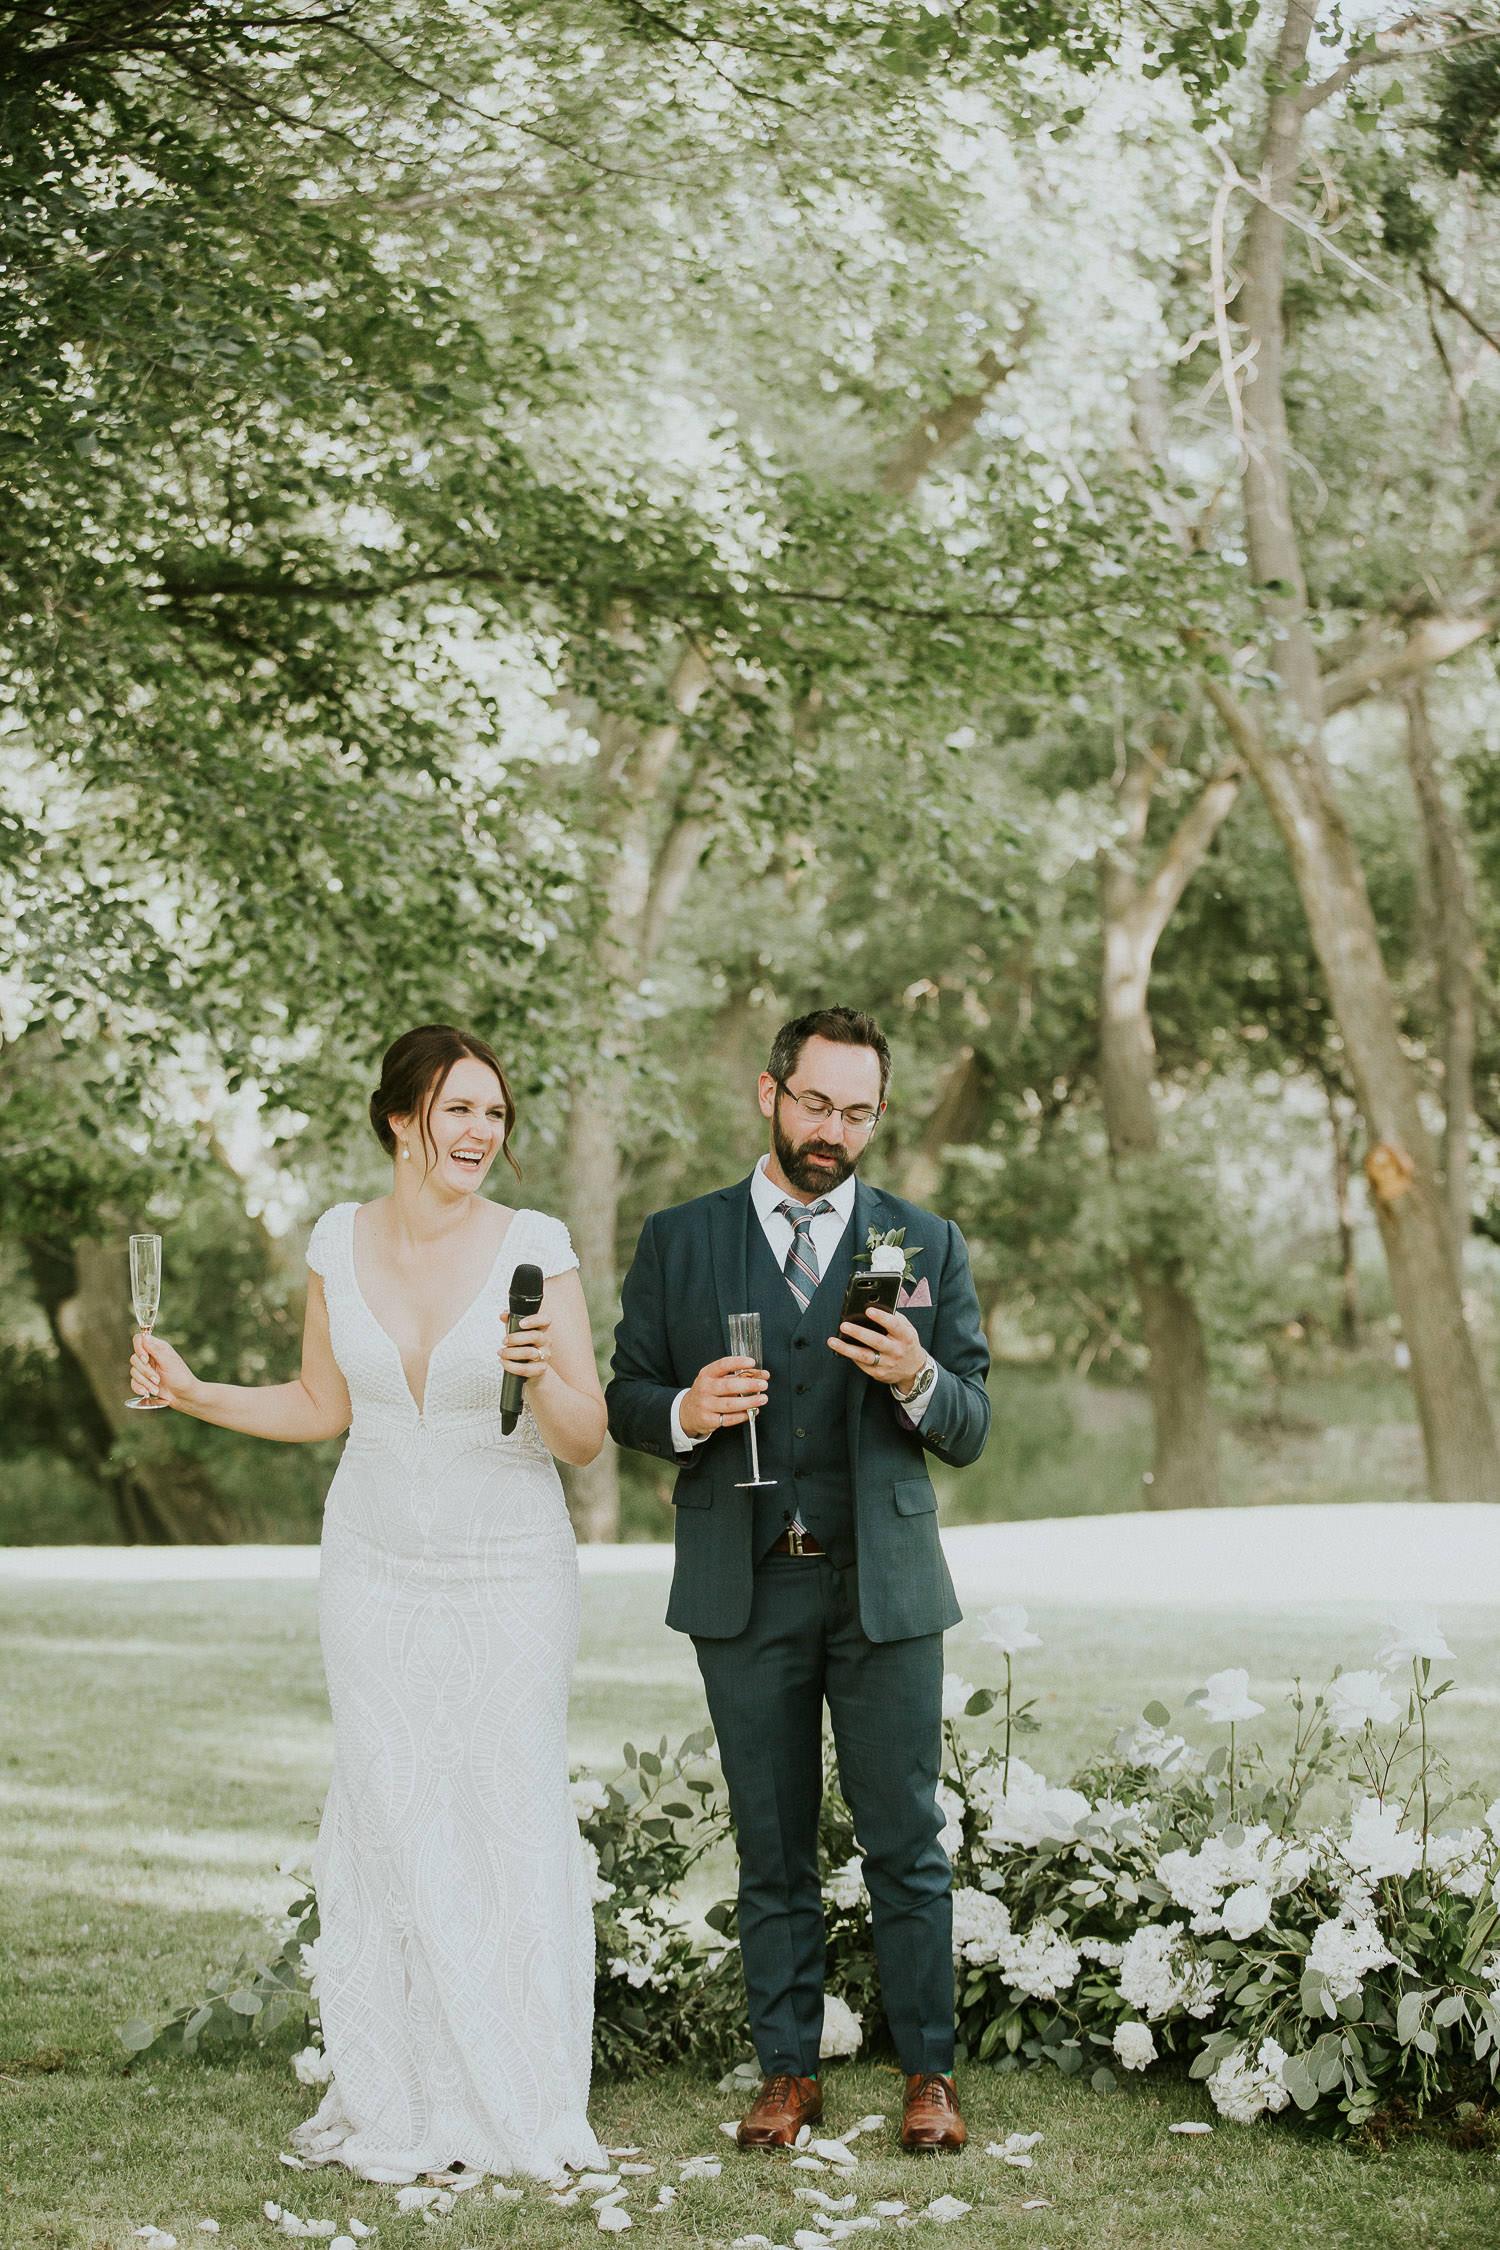 summer-backyard-wedding-in-alberta-sarah-pukin-0168